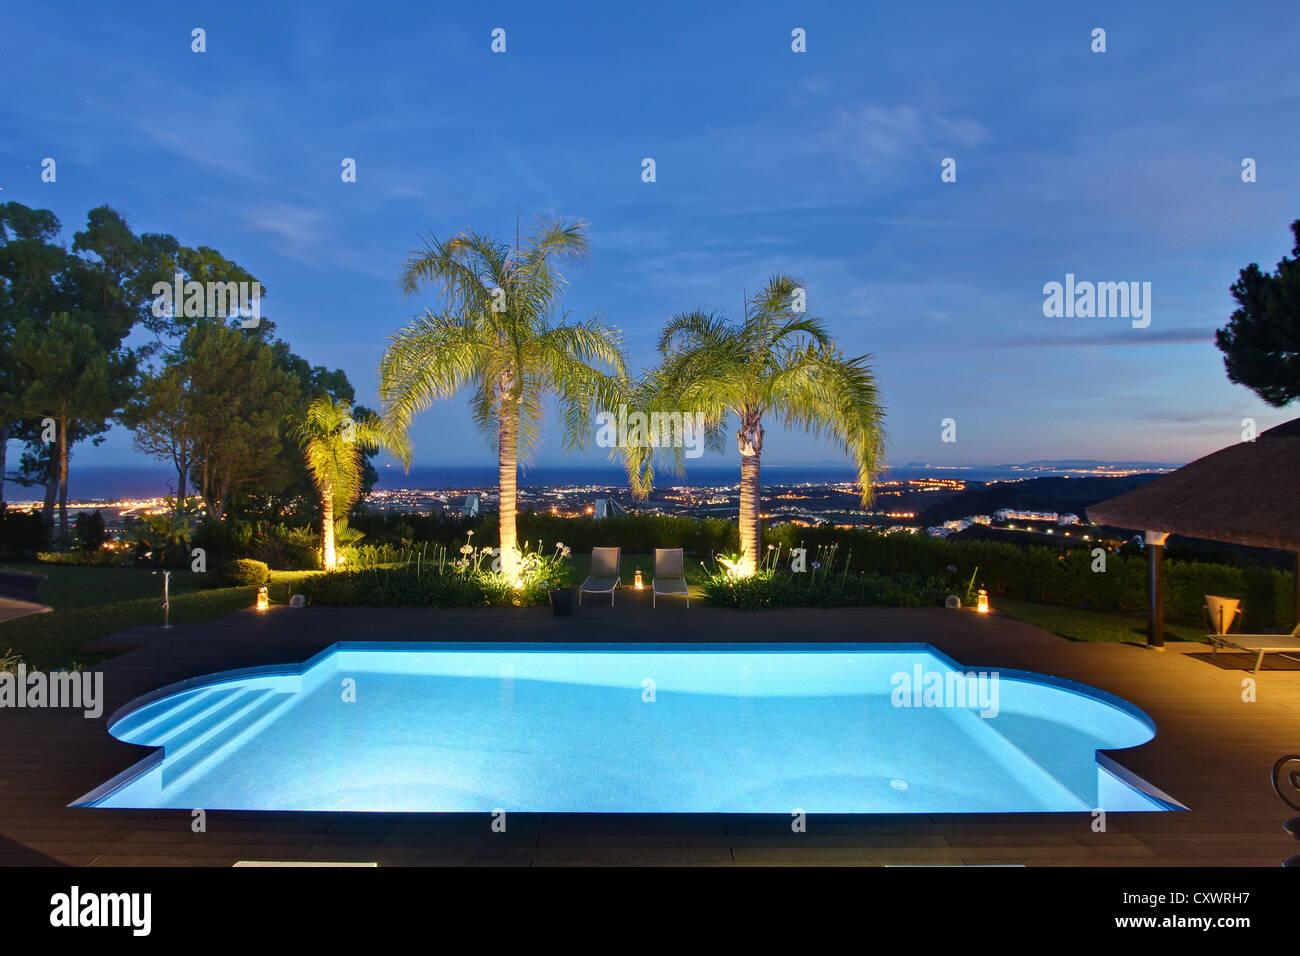 Beleuchteten Pool und Palmen Bäume Stockbild